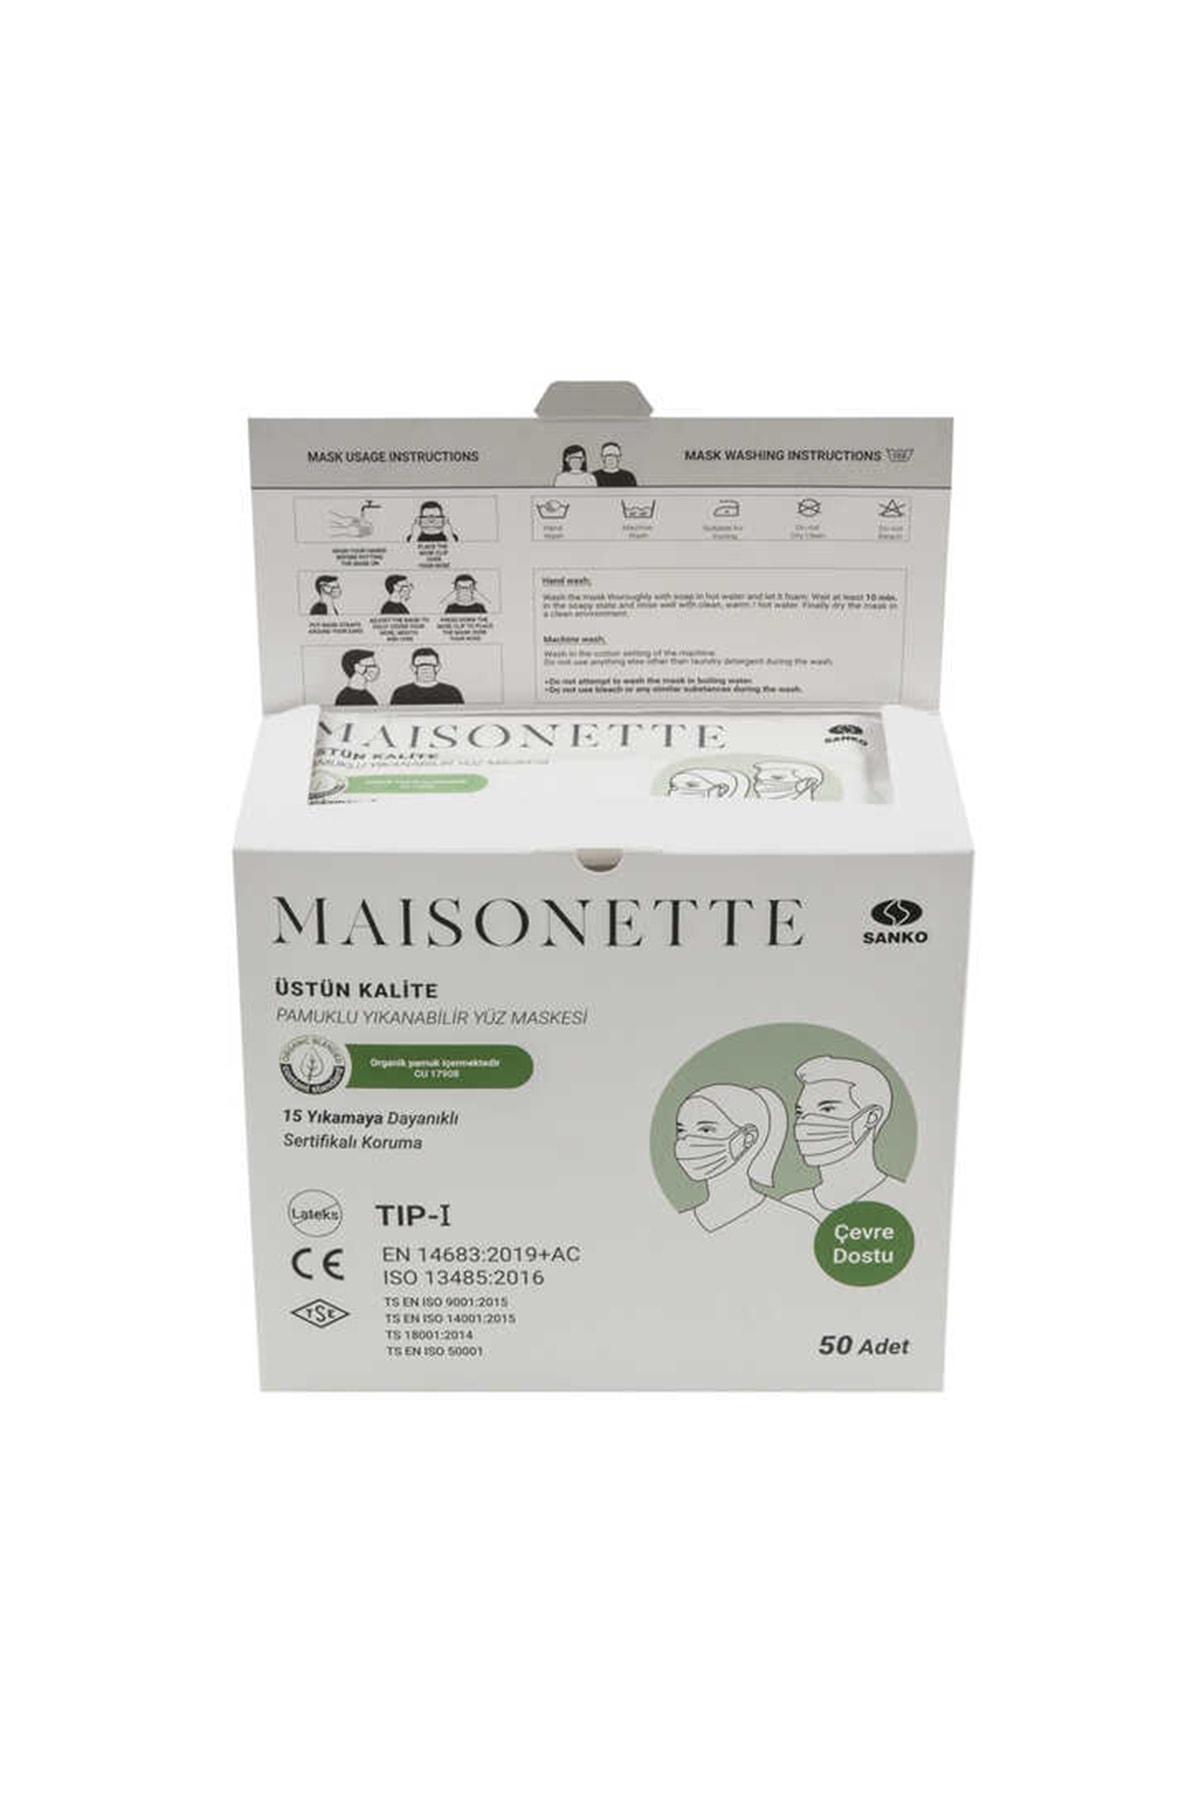 Maisonette Yıkanabilir Pamuklu Yüz Maskesi 50 li Paket 1